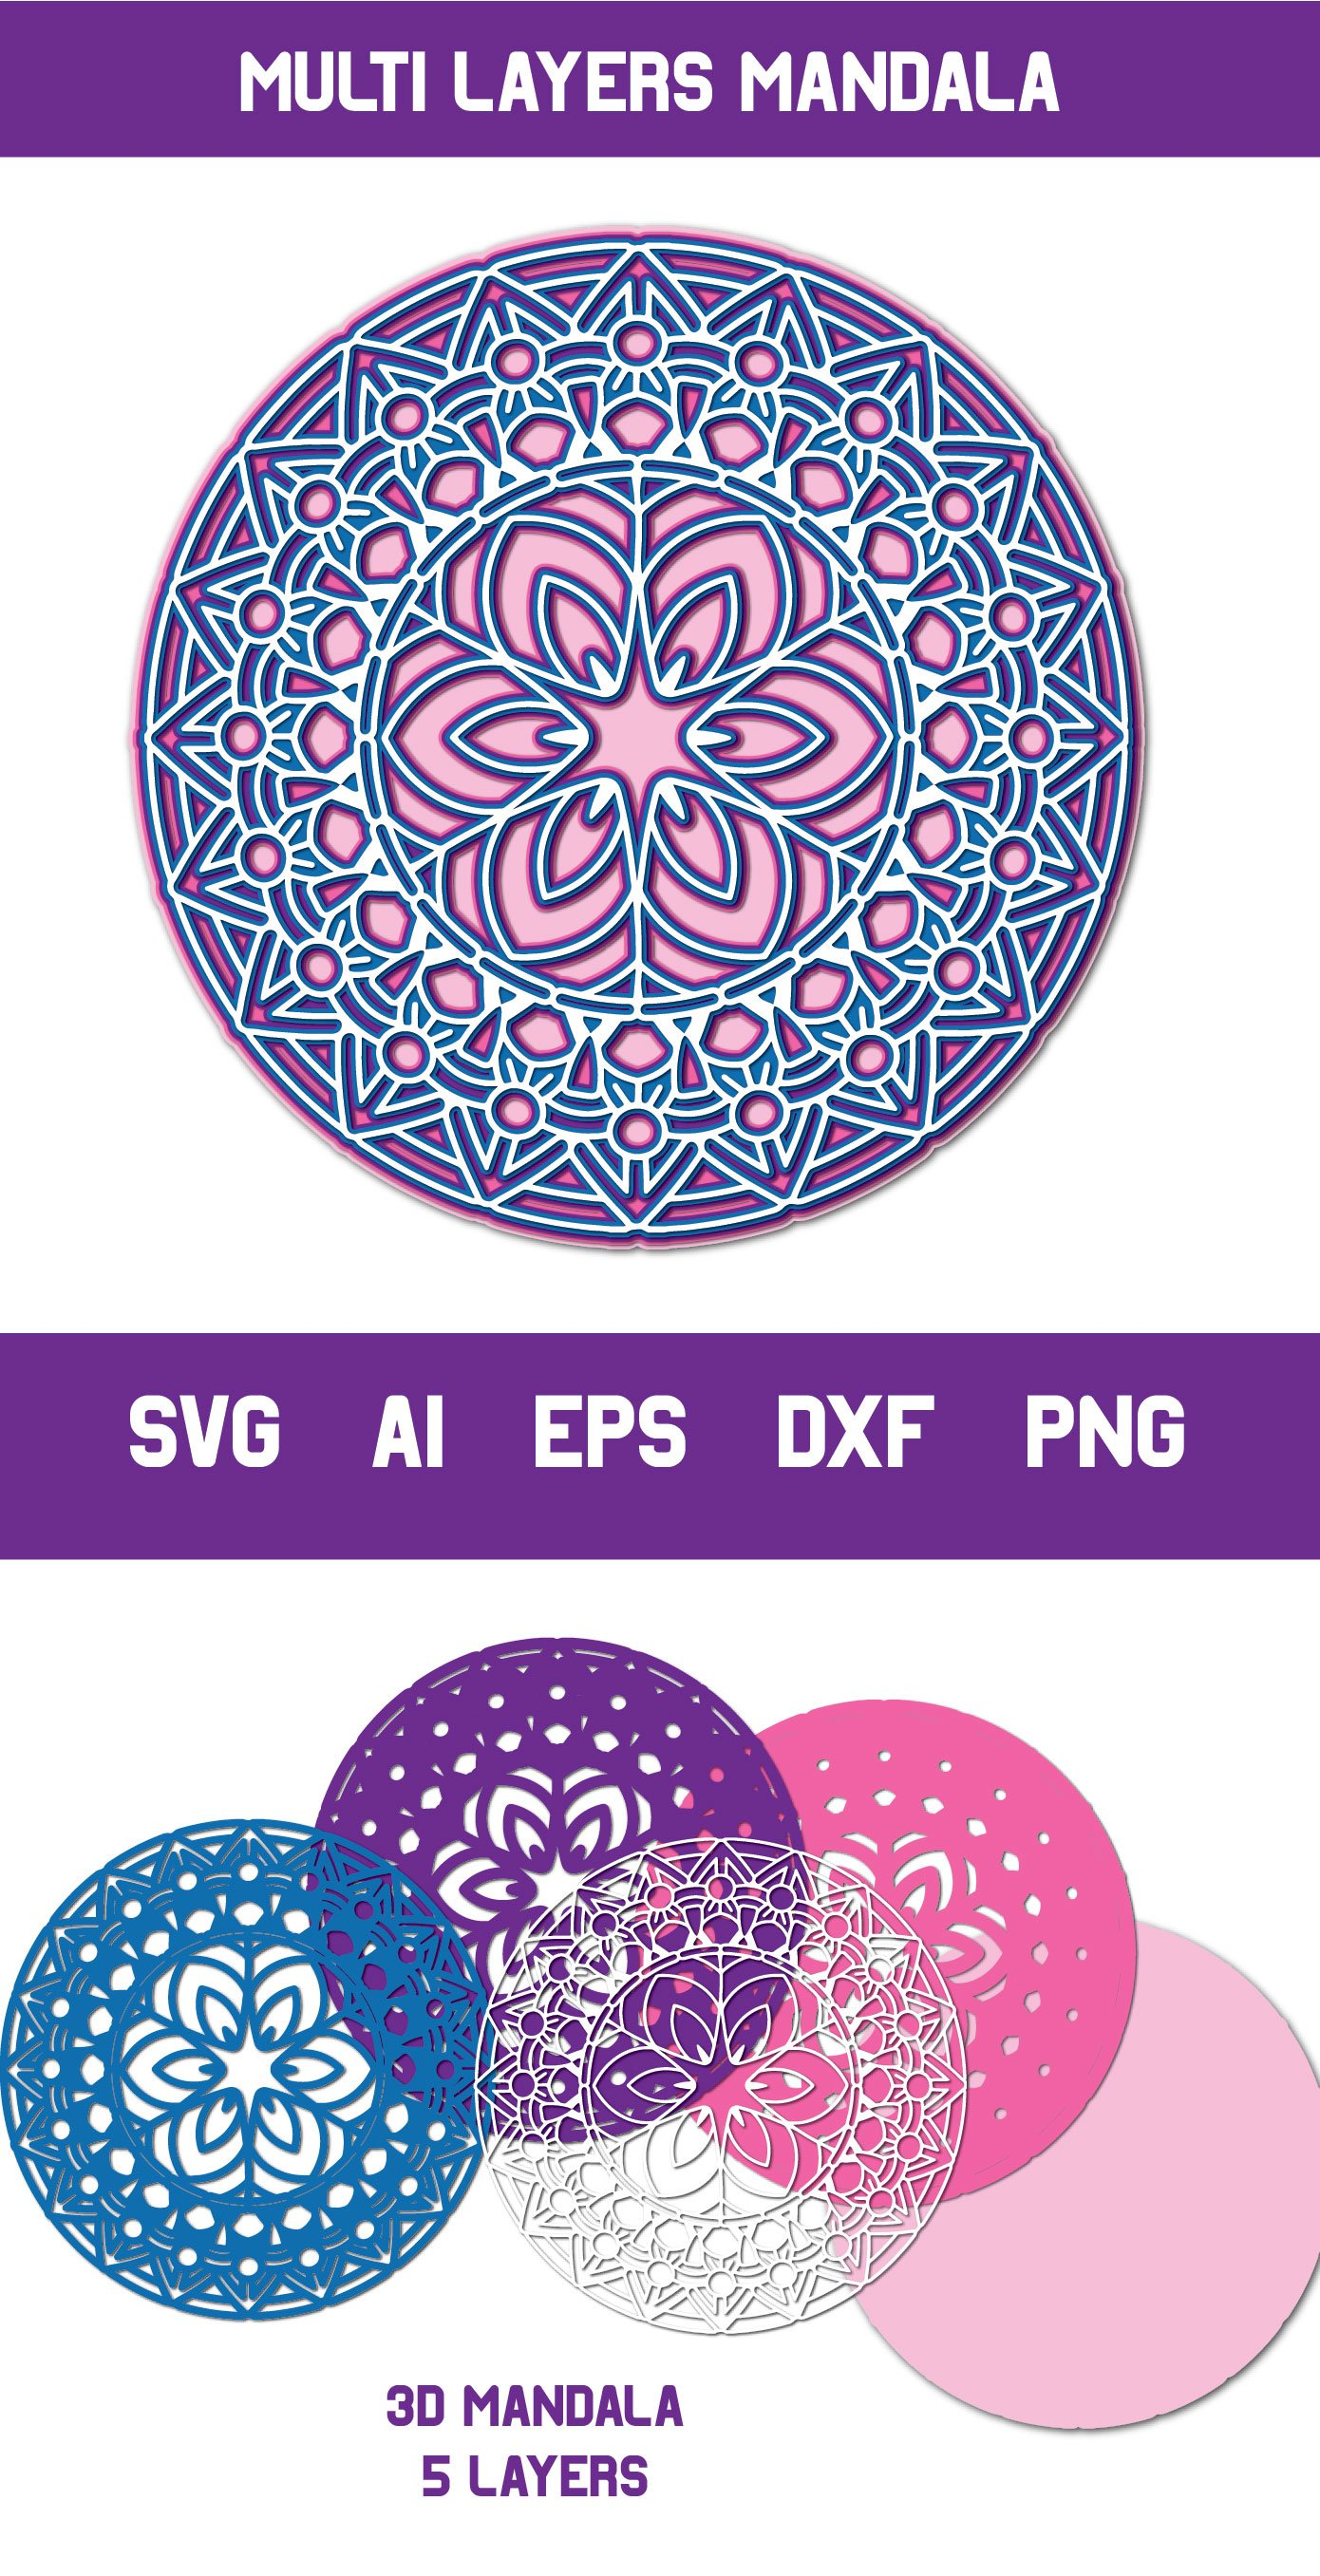 113+ 3D Mandala Svg Free – SVG,PNG,DXF,EPS include